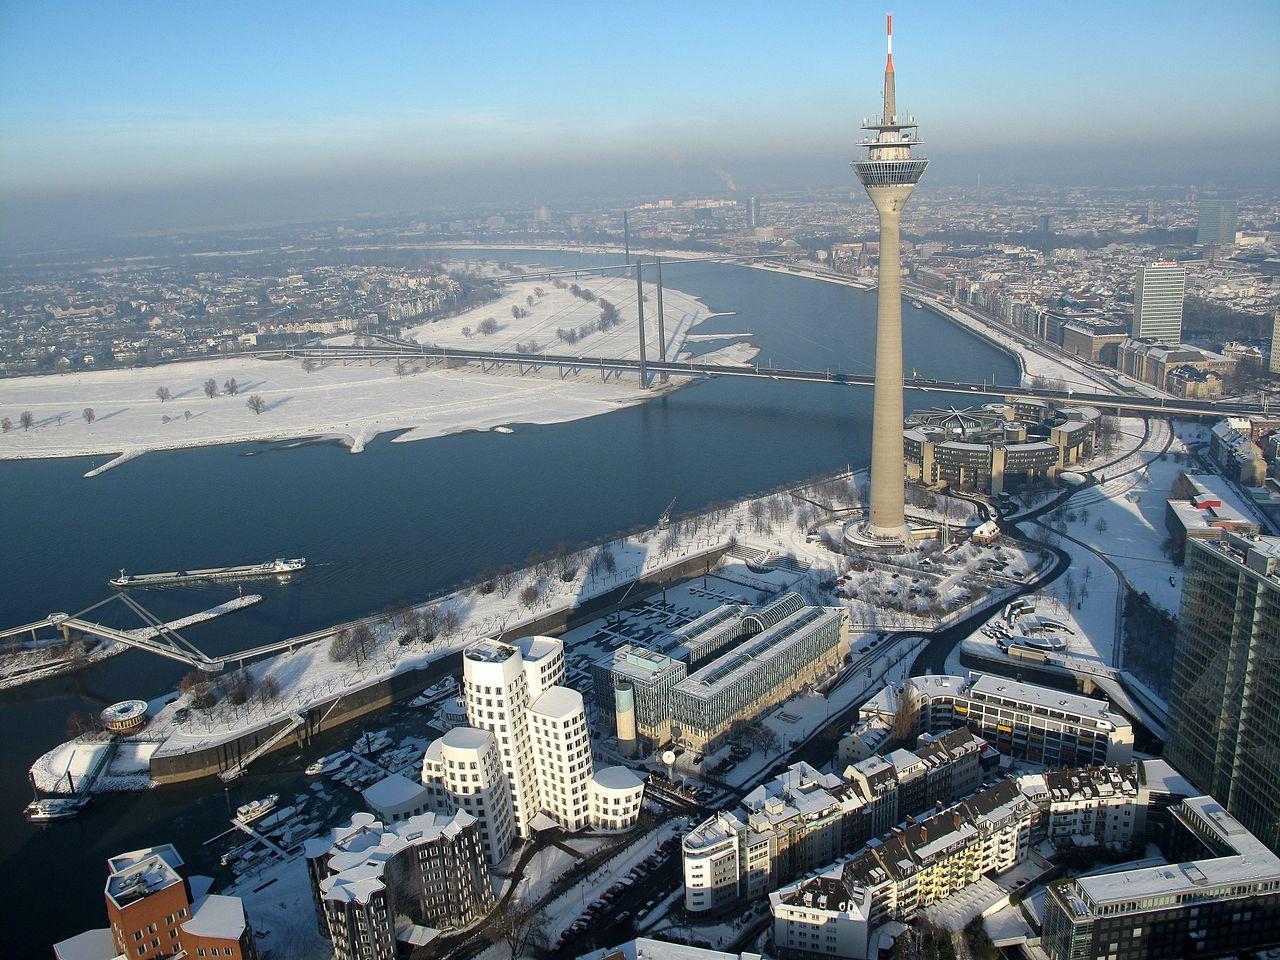 The Düsseldorf Skyline with tower